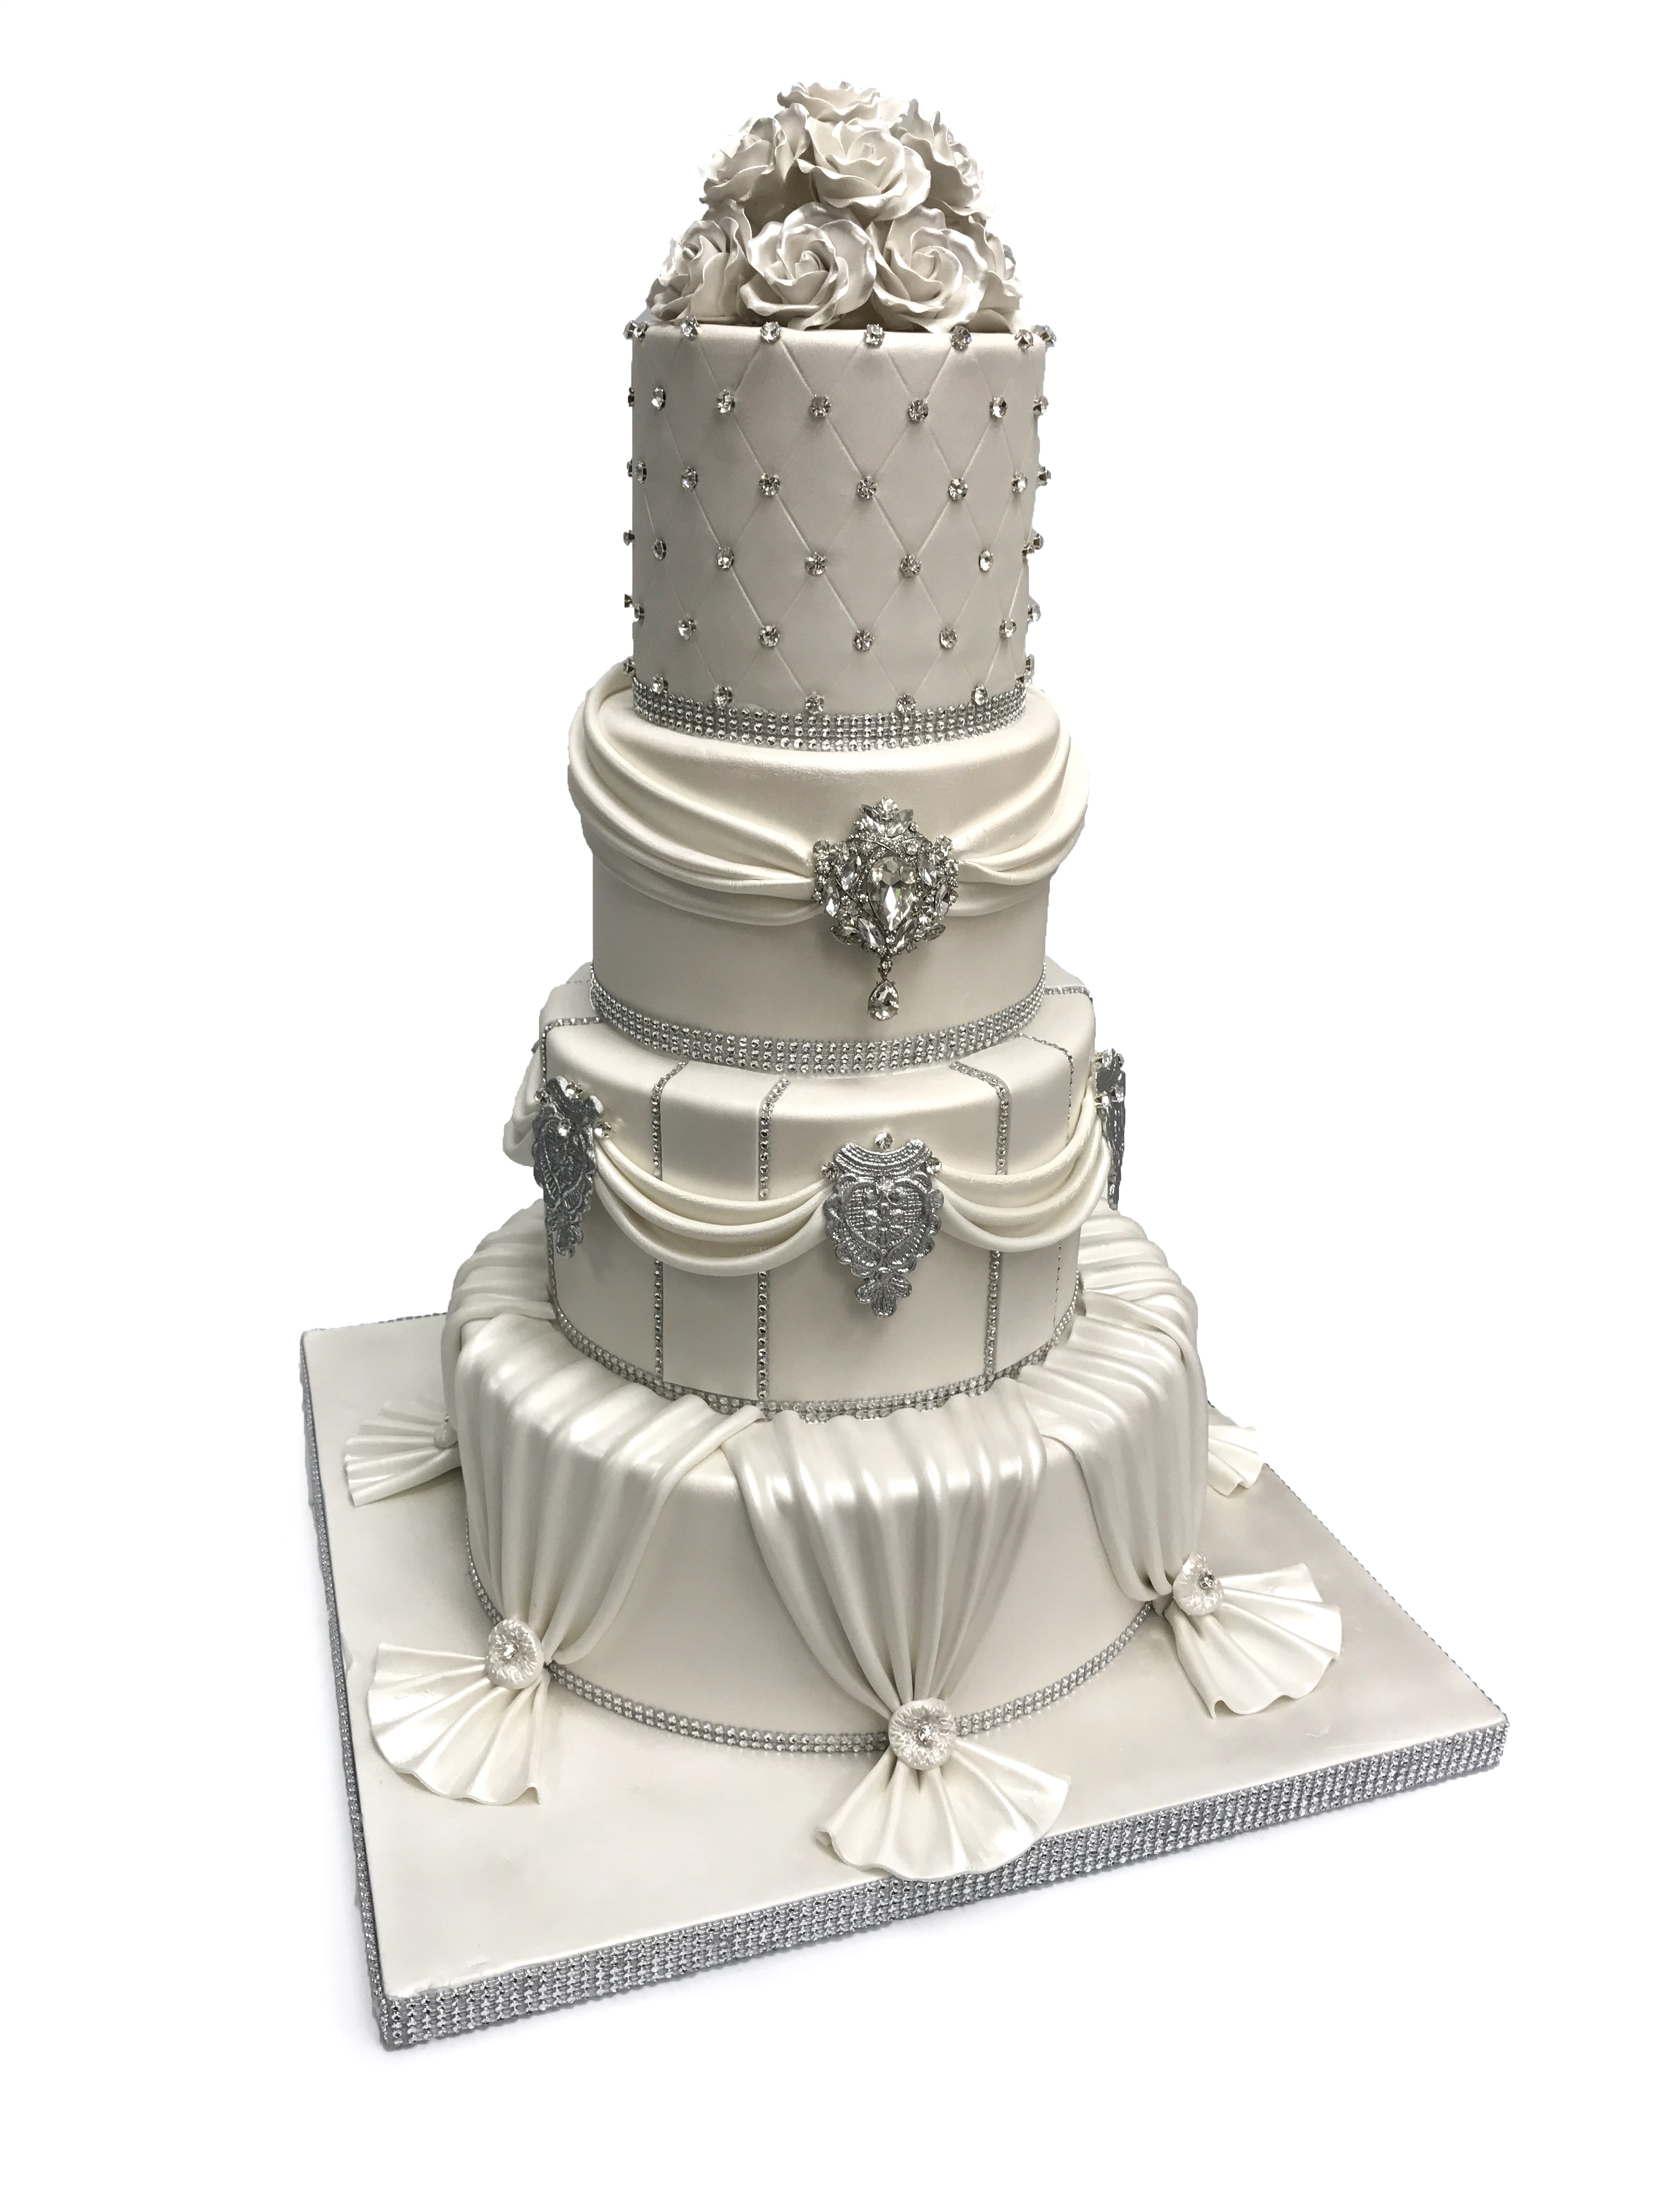 The Best Las Vegas Wedding Cakes | Las Vegas Weddings